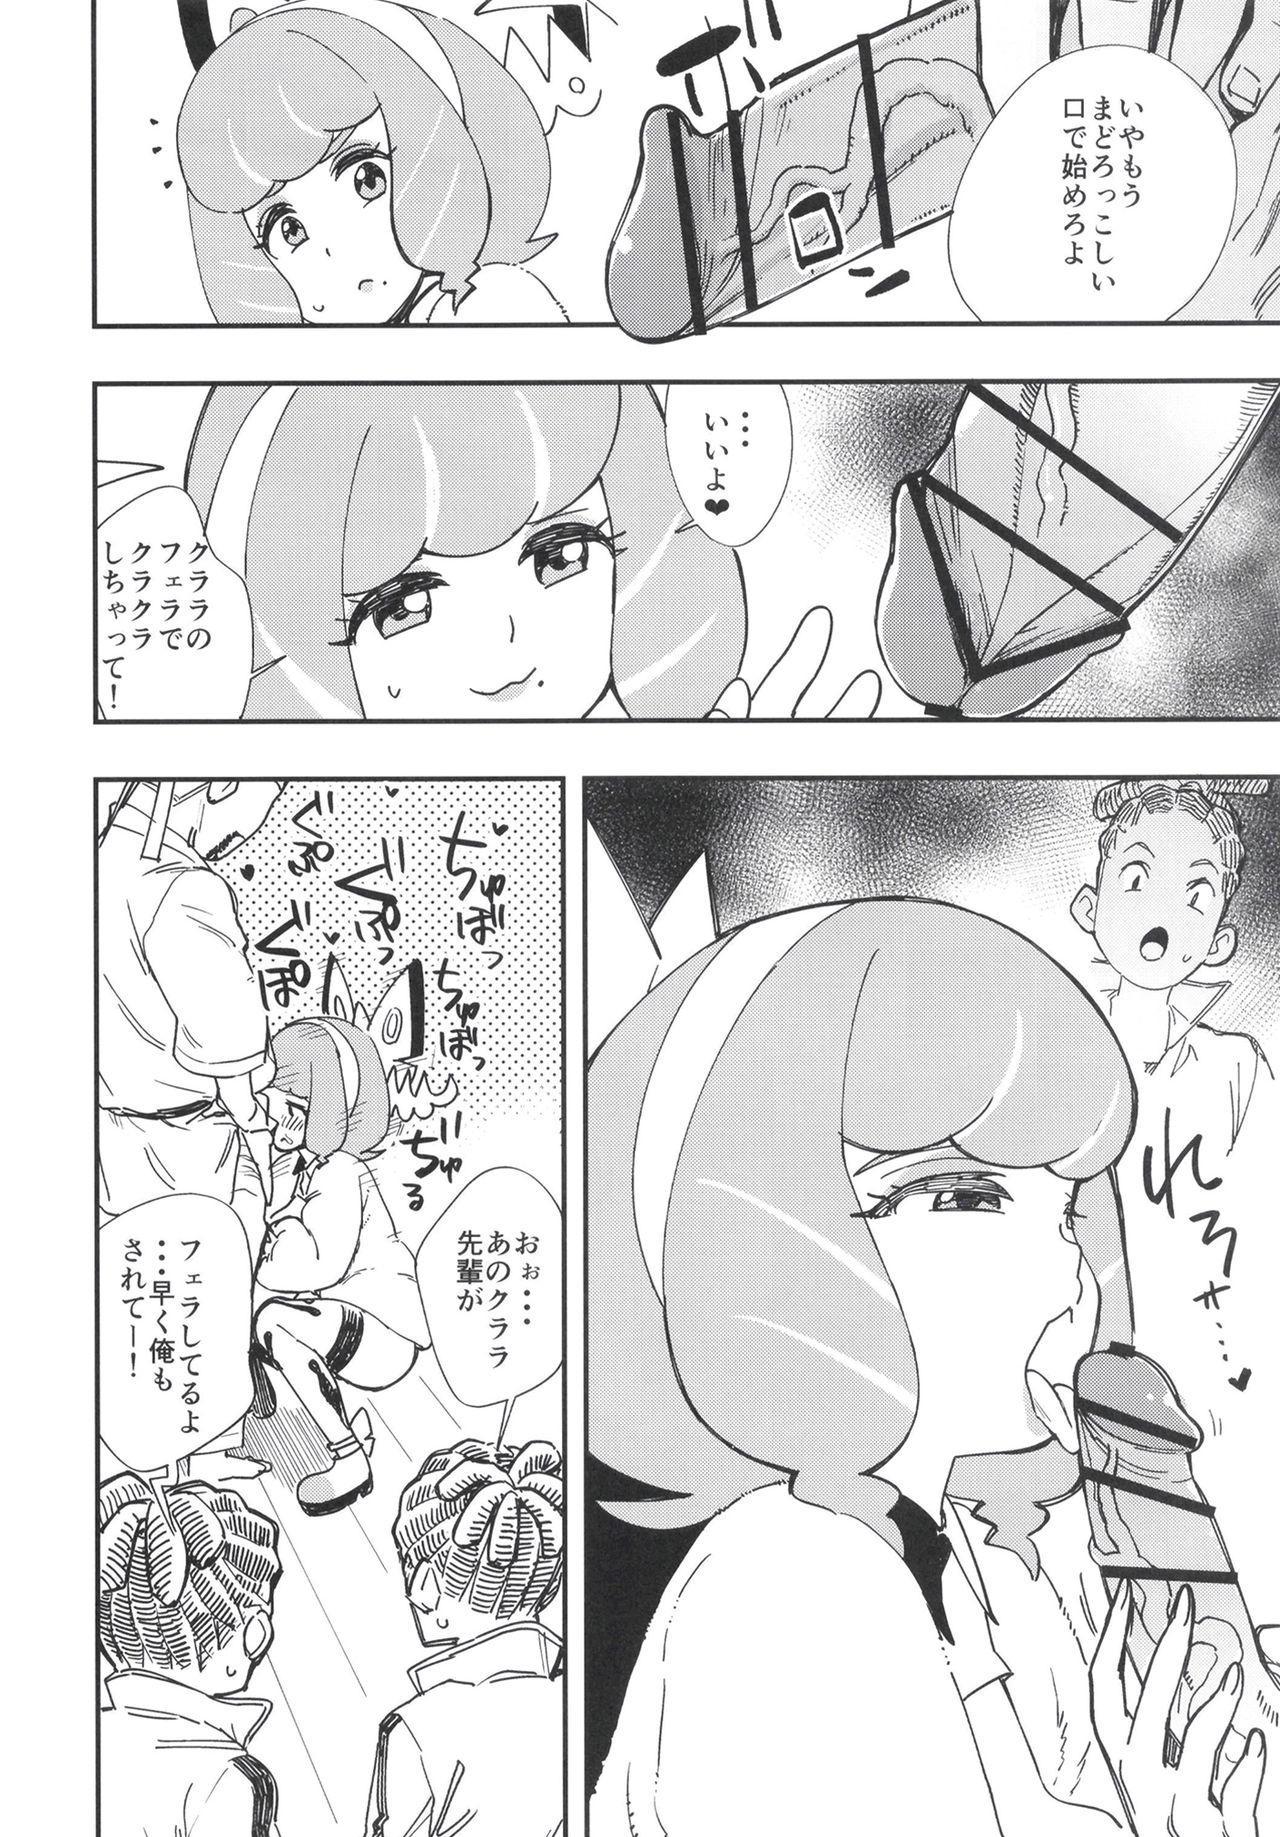 Kurakura Kyouka Gekkan 5